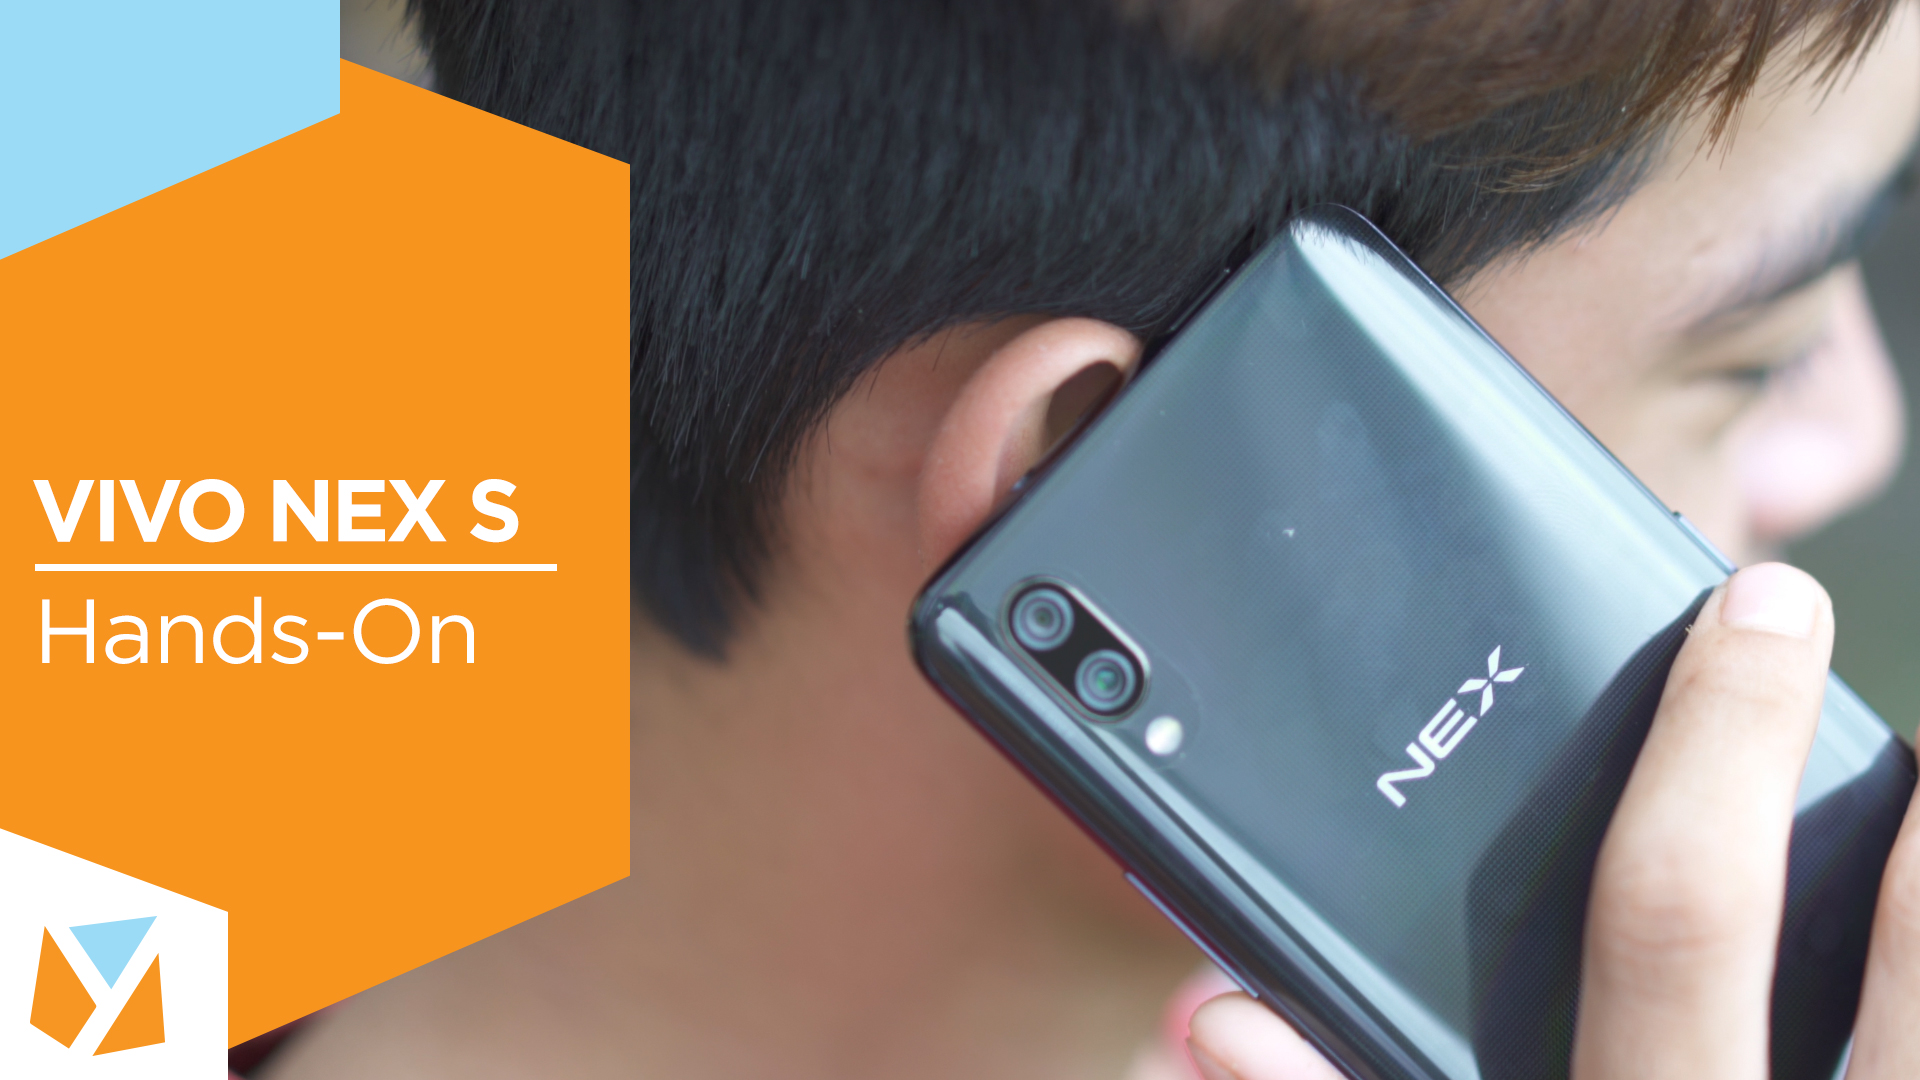 Motorola Moto E4 Plus now available in stores - YugaTech